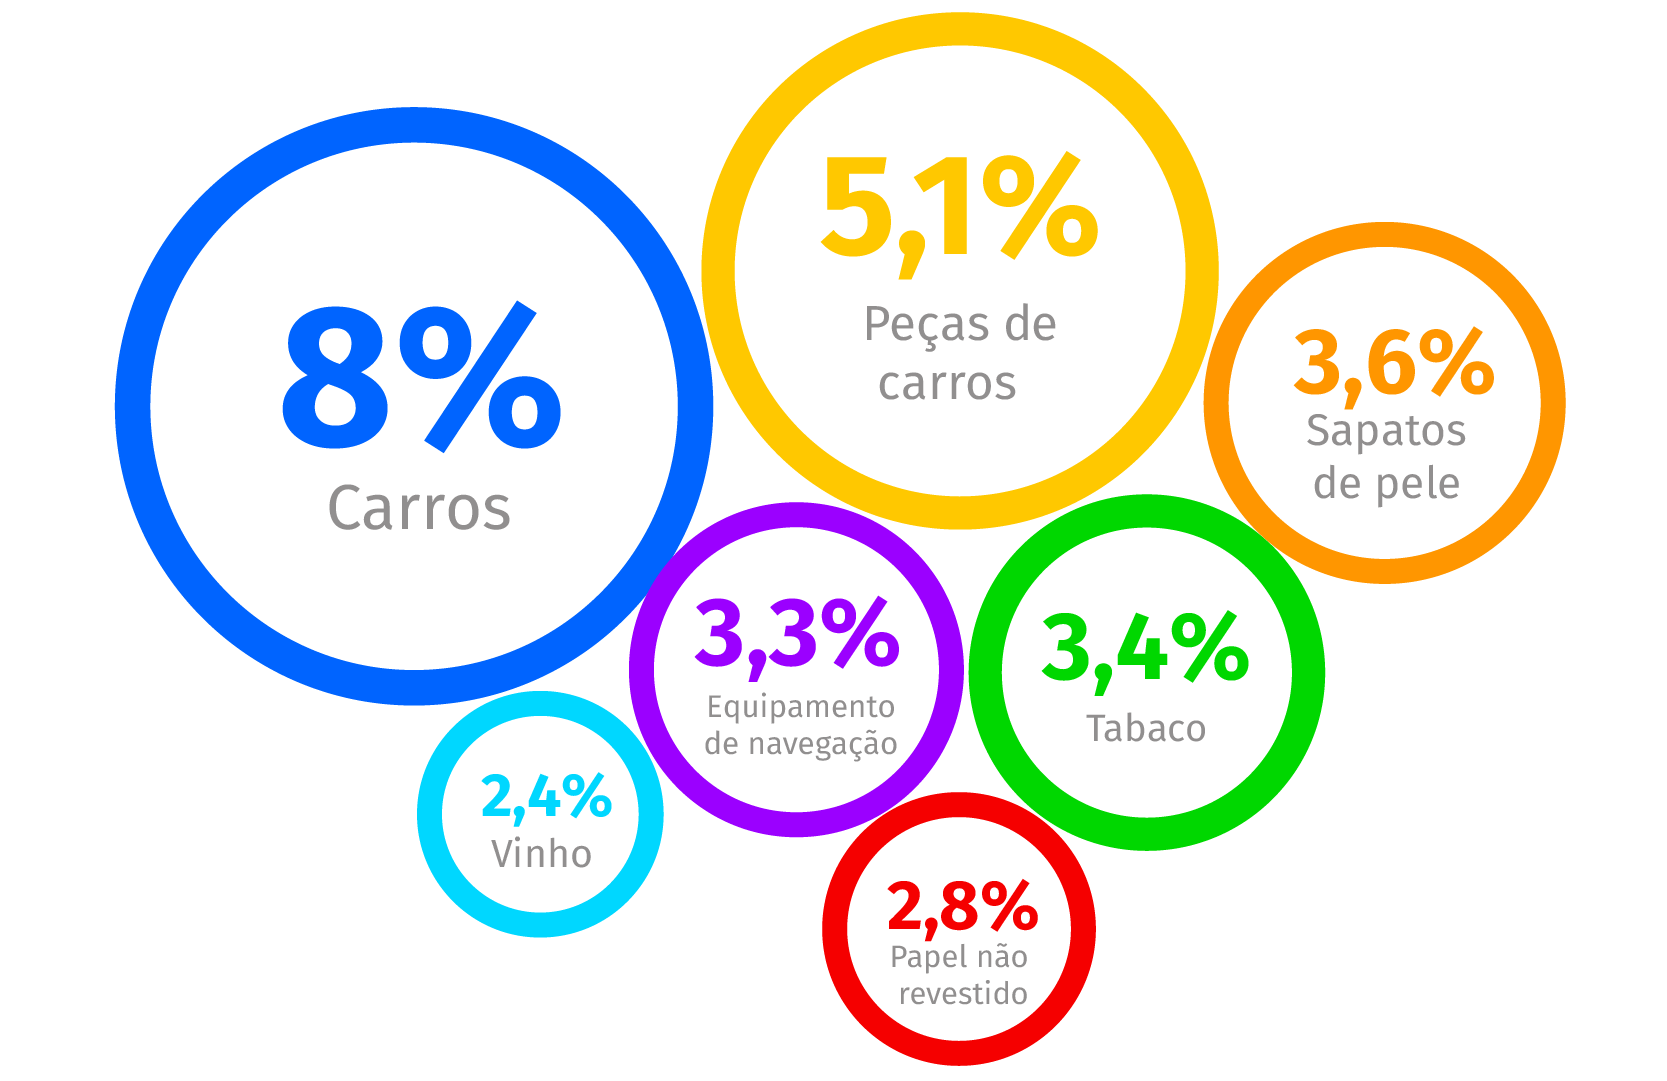 Fonte: The Observatory of Economic Complexity. Dados relativos a 2014.